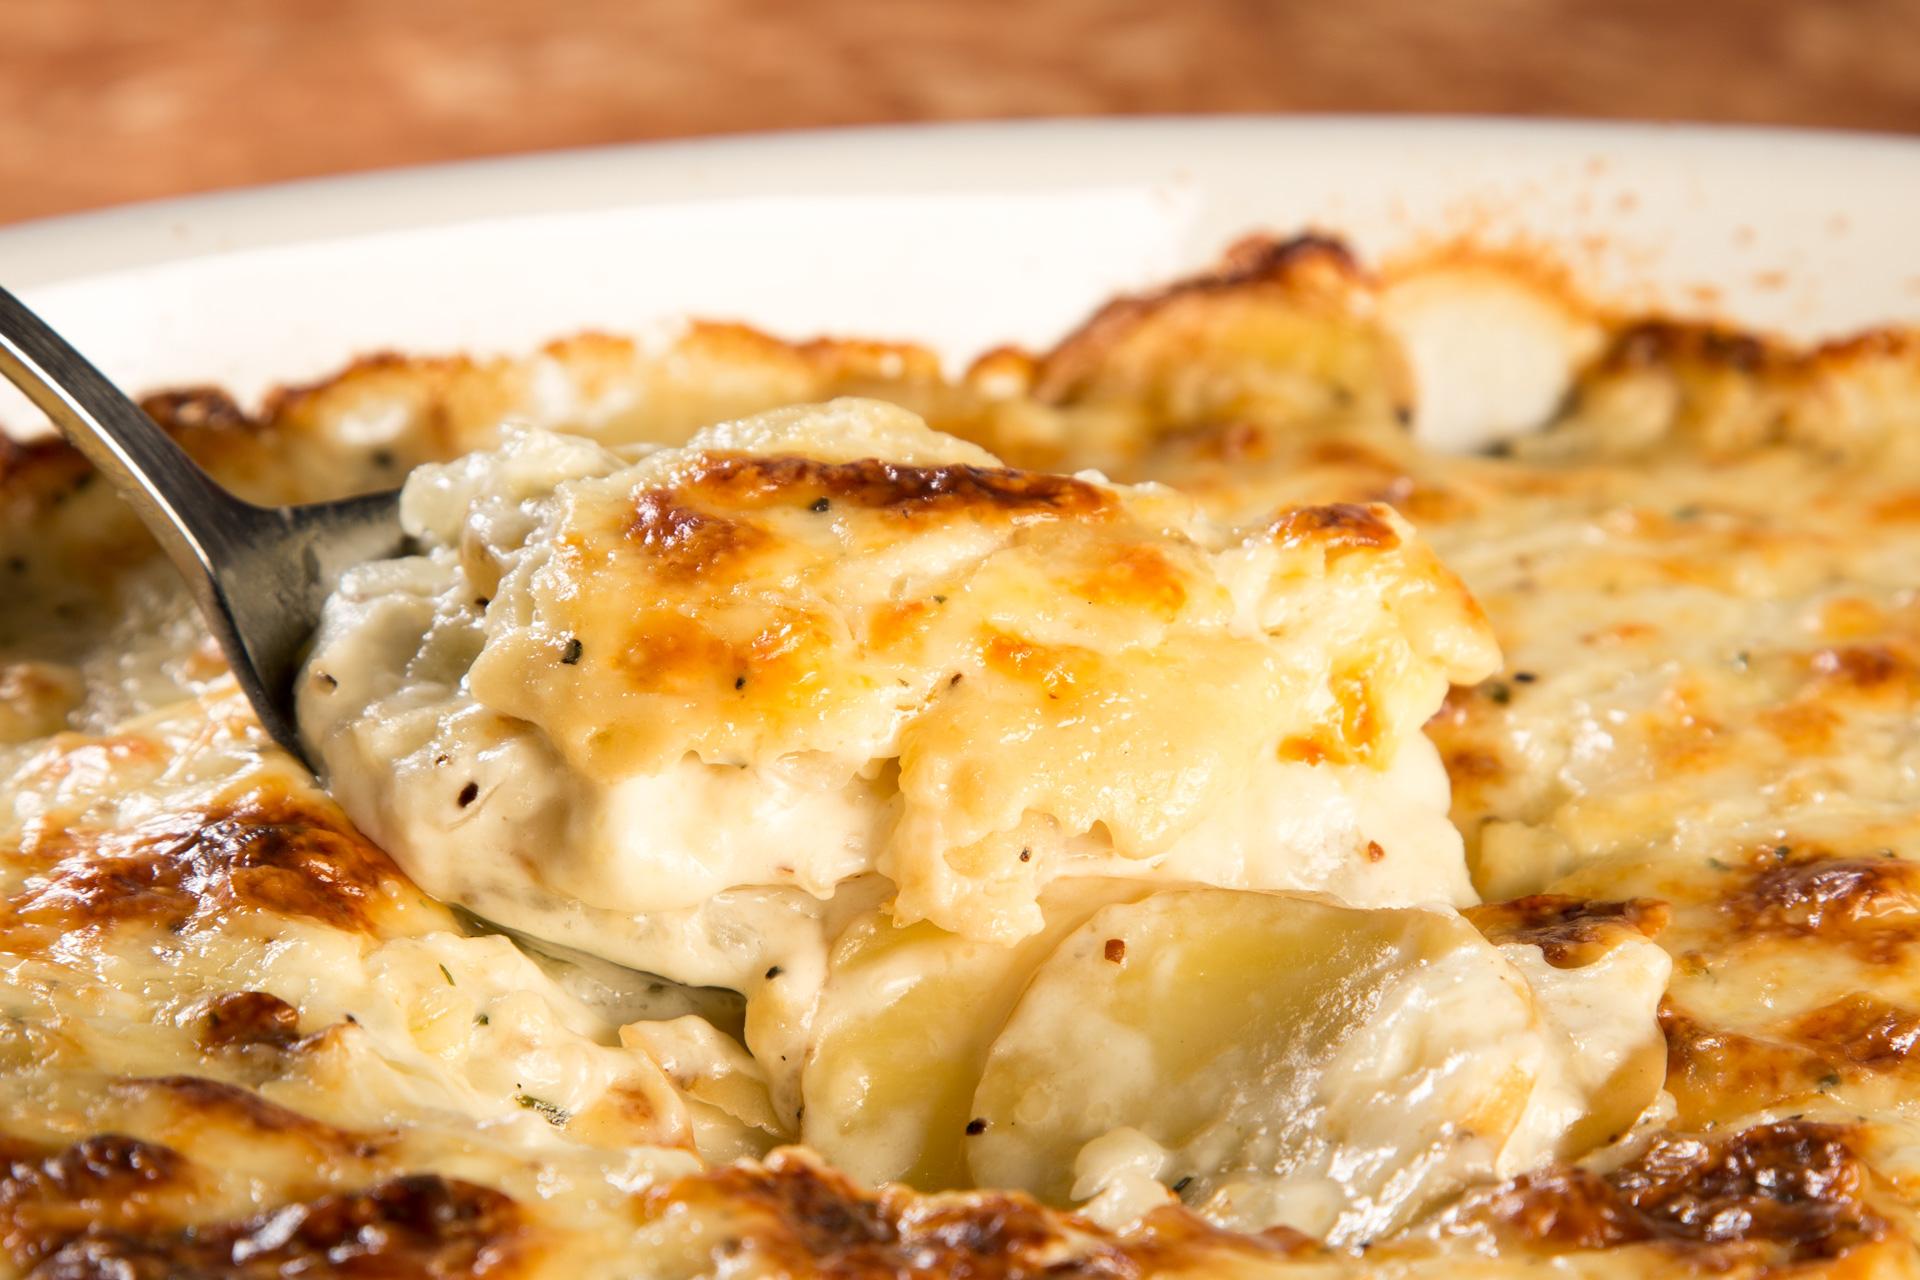 How to Make Classic Scalloped Potatoes